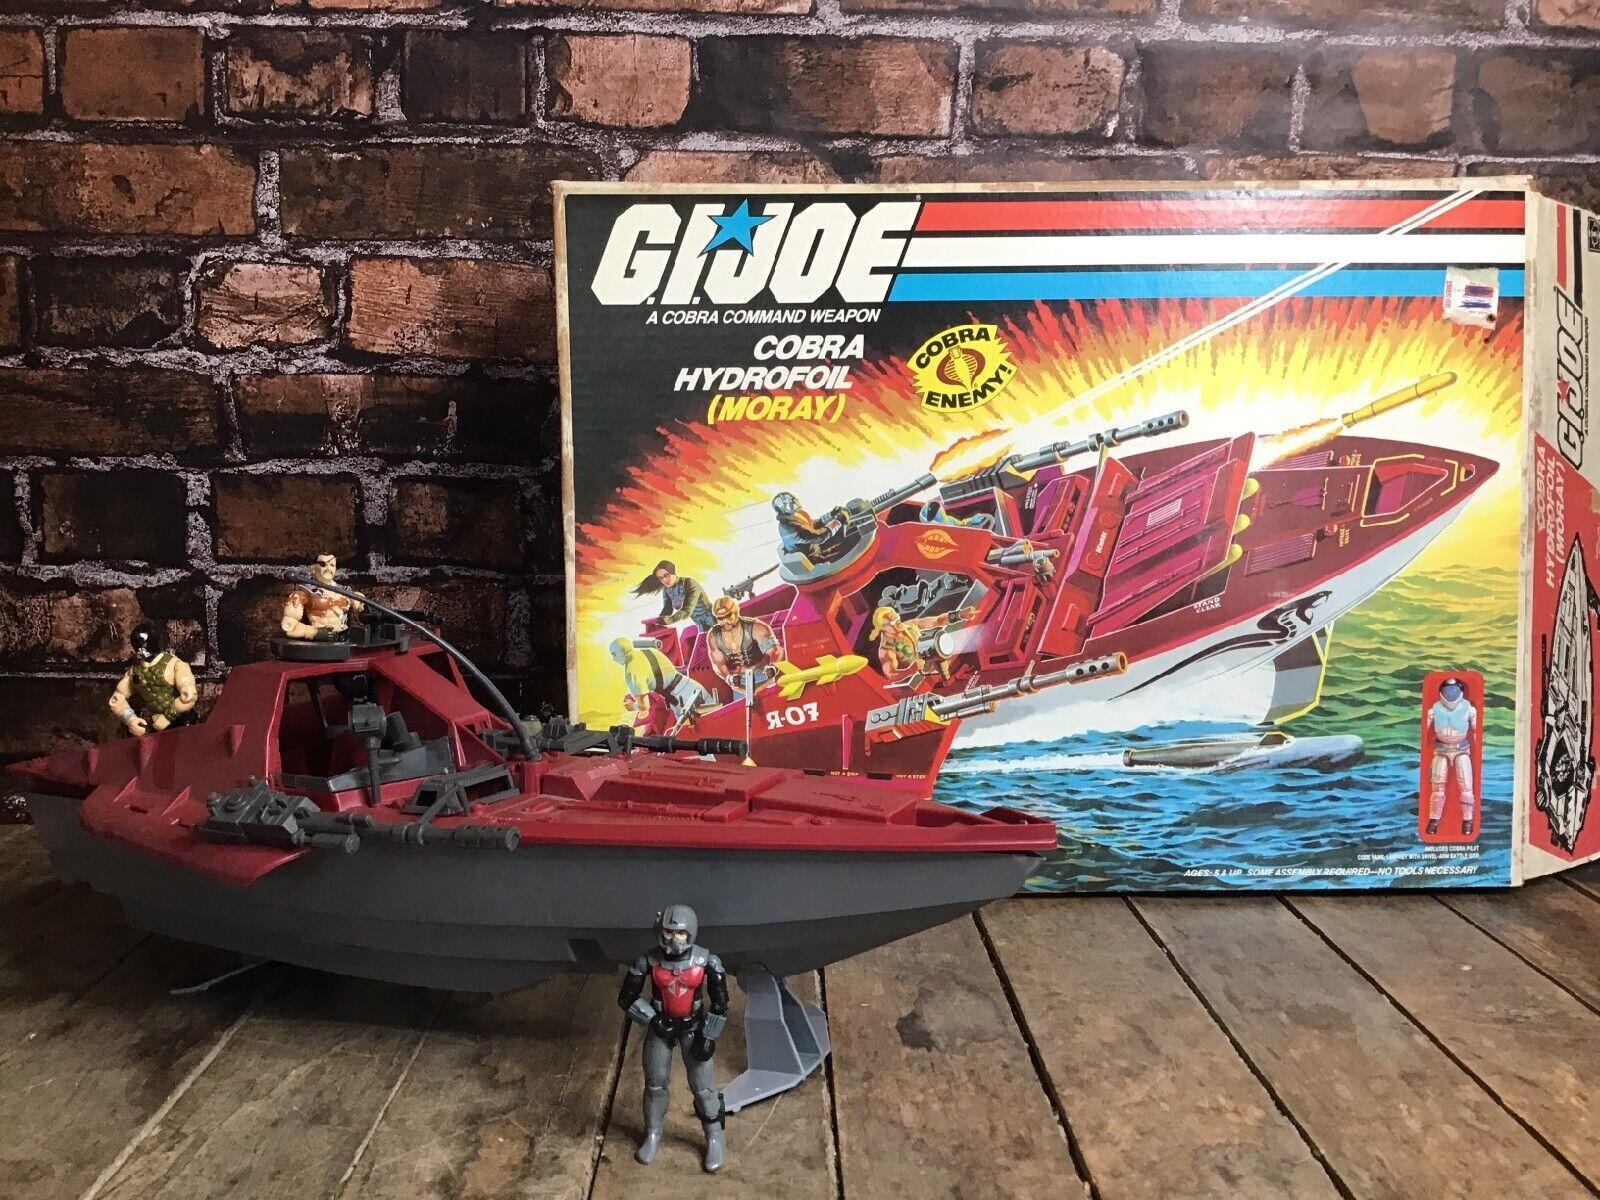 G.I JOE-Moray Hydroptère Top Gun Turret-Original 1985 un vrai héros américain